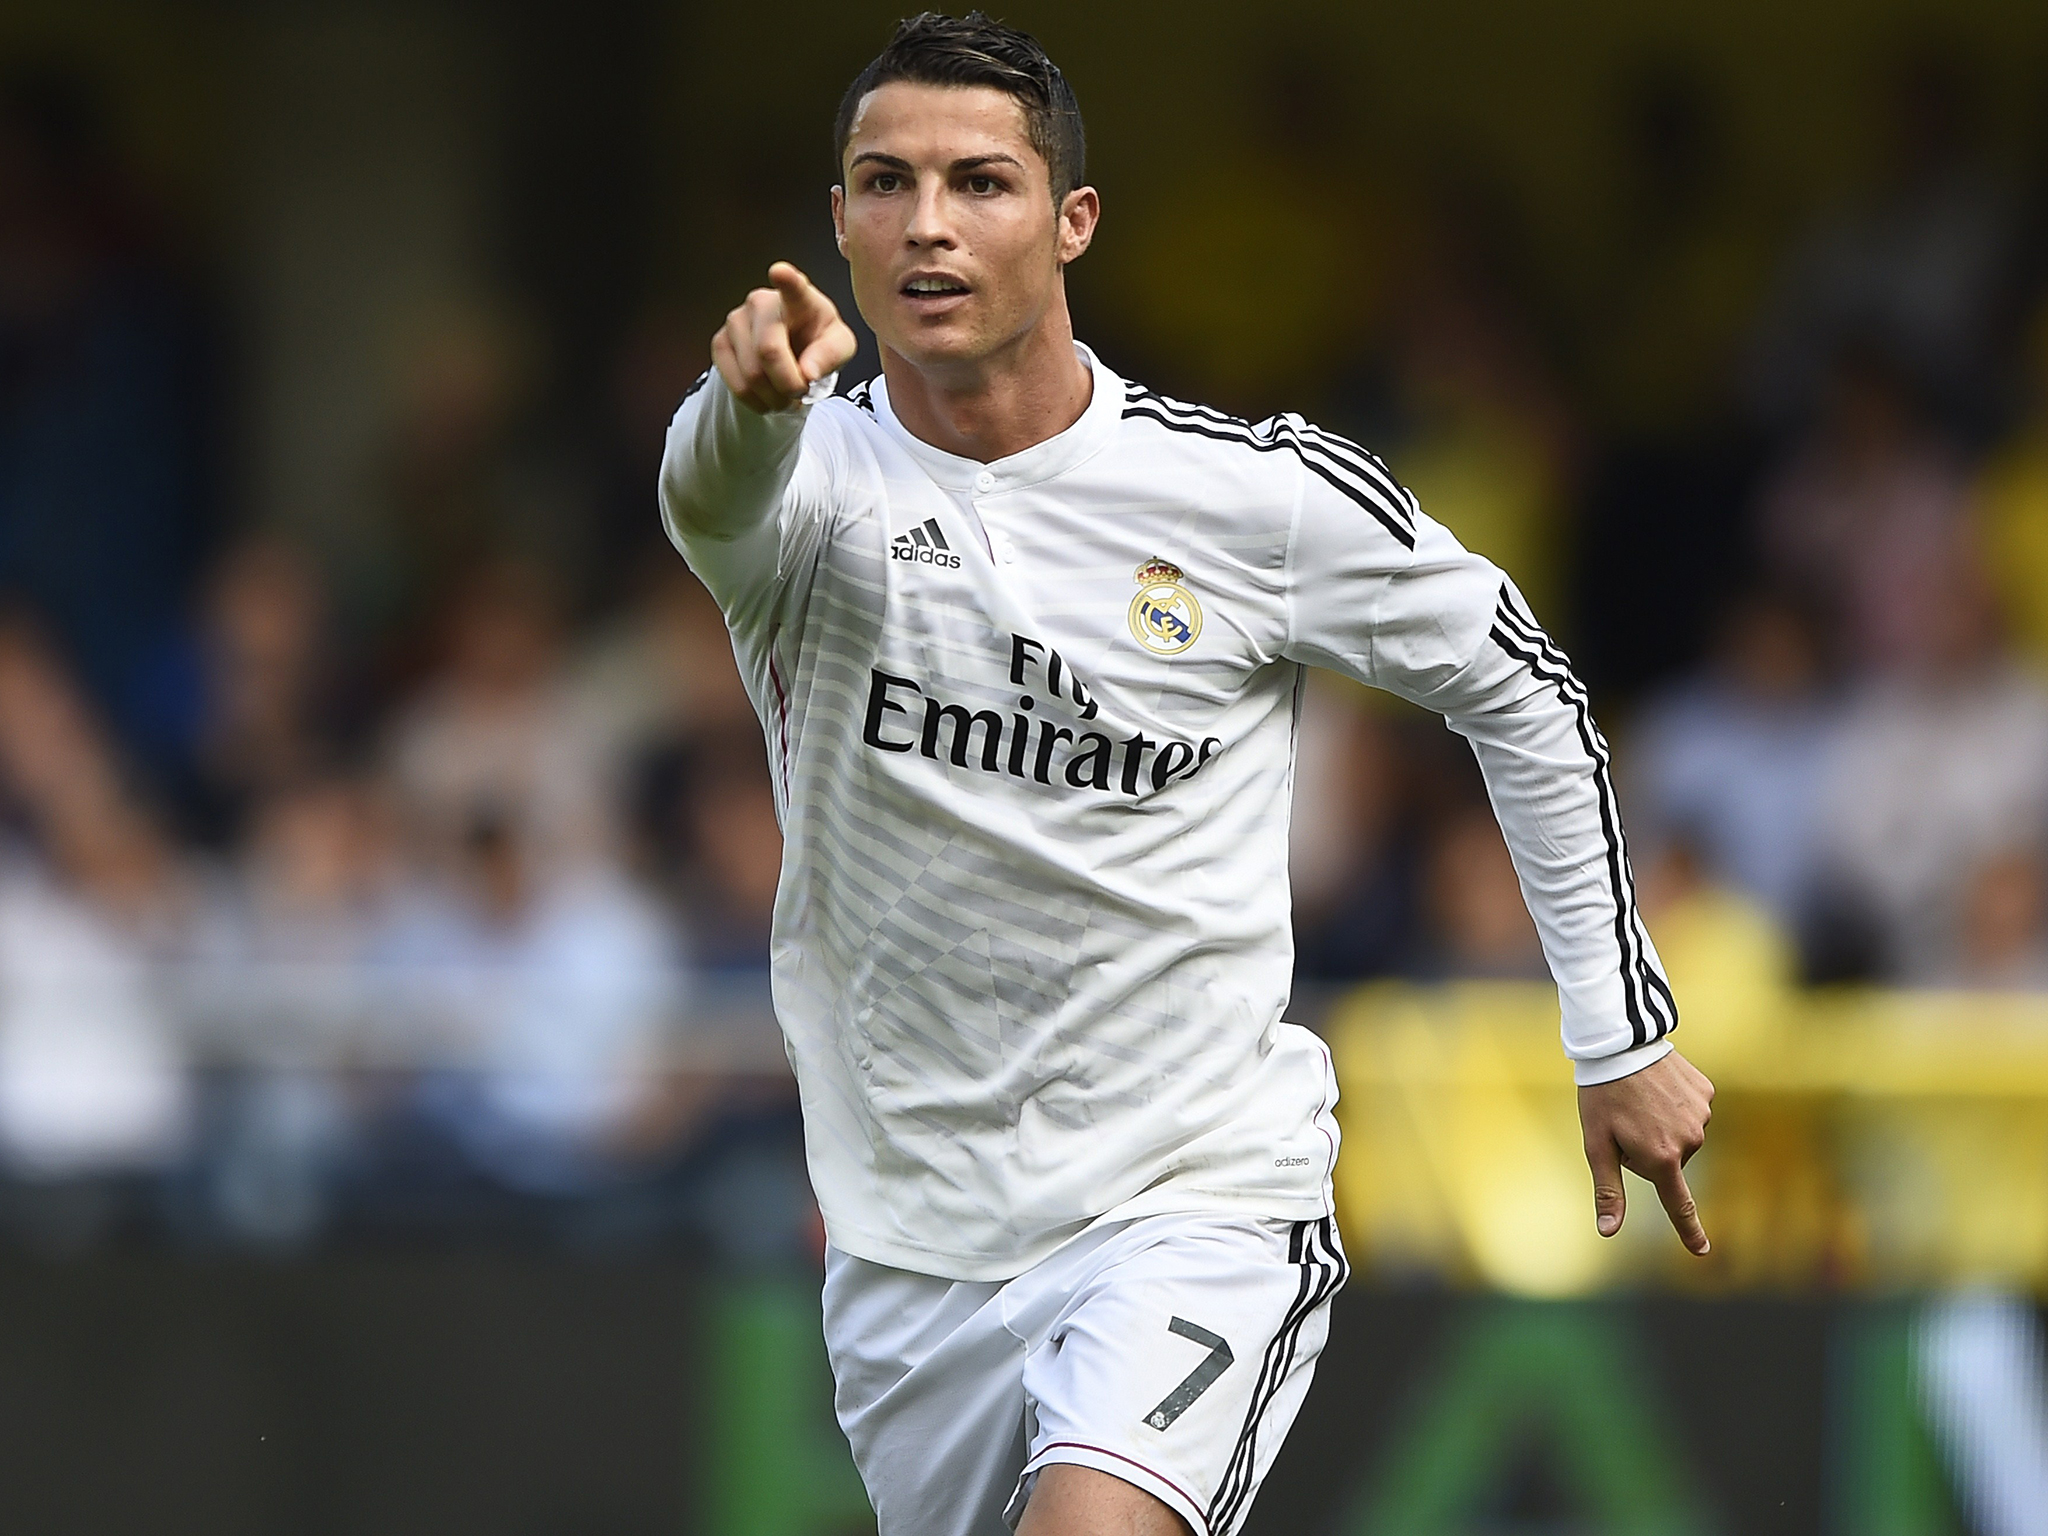 Images of Cristiano Ronaldo | 2048x1536